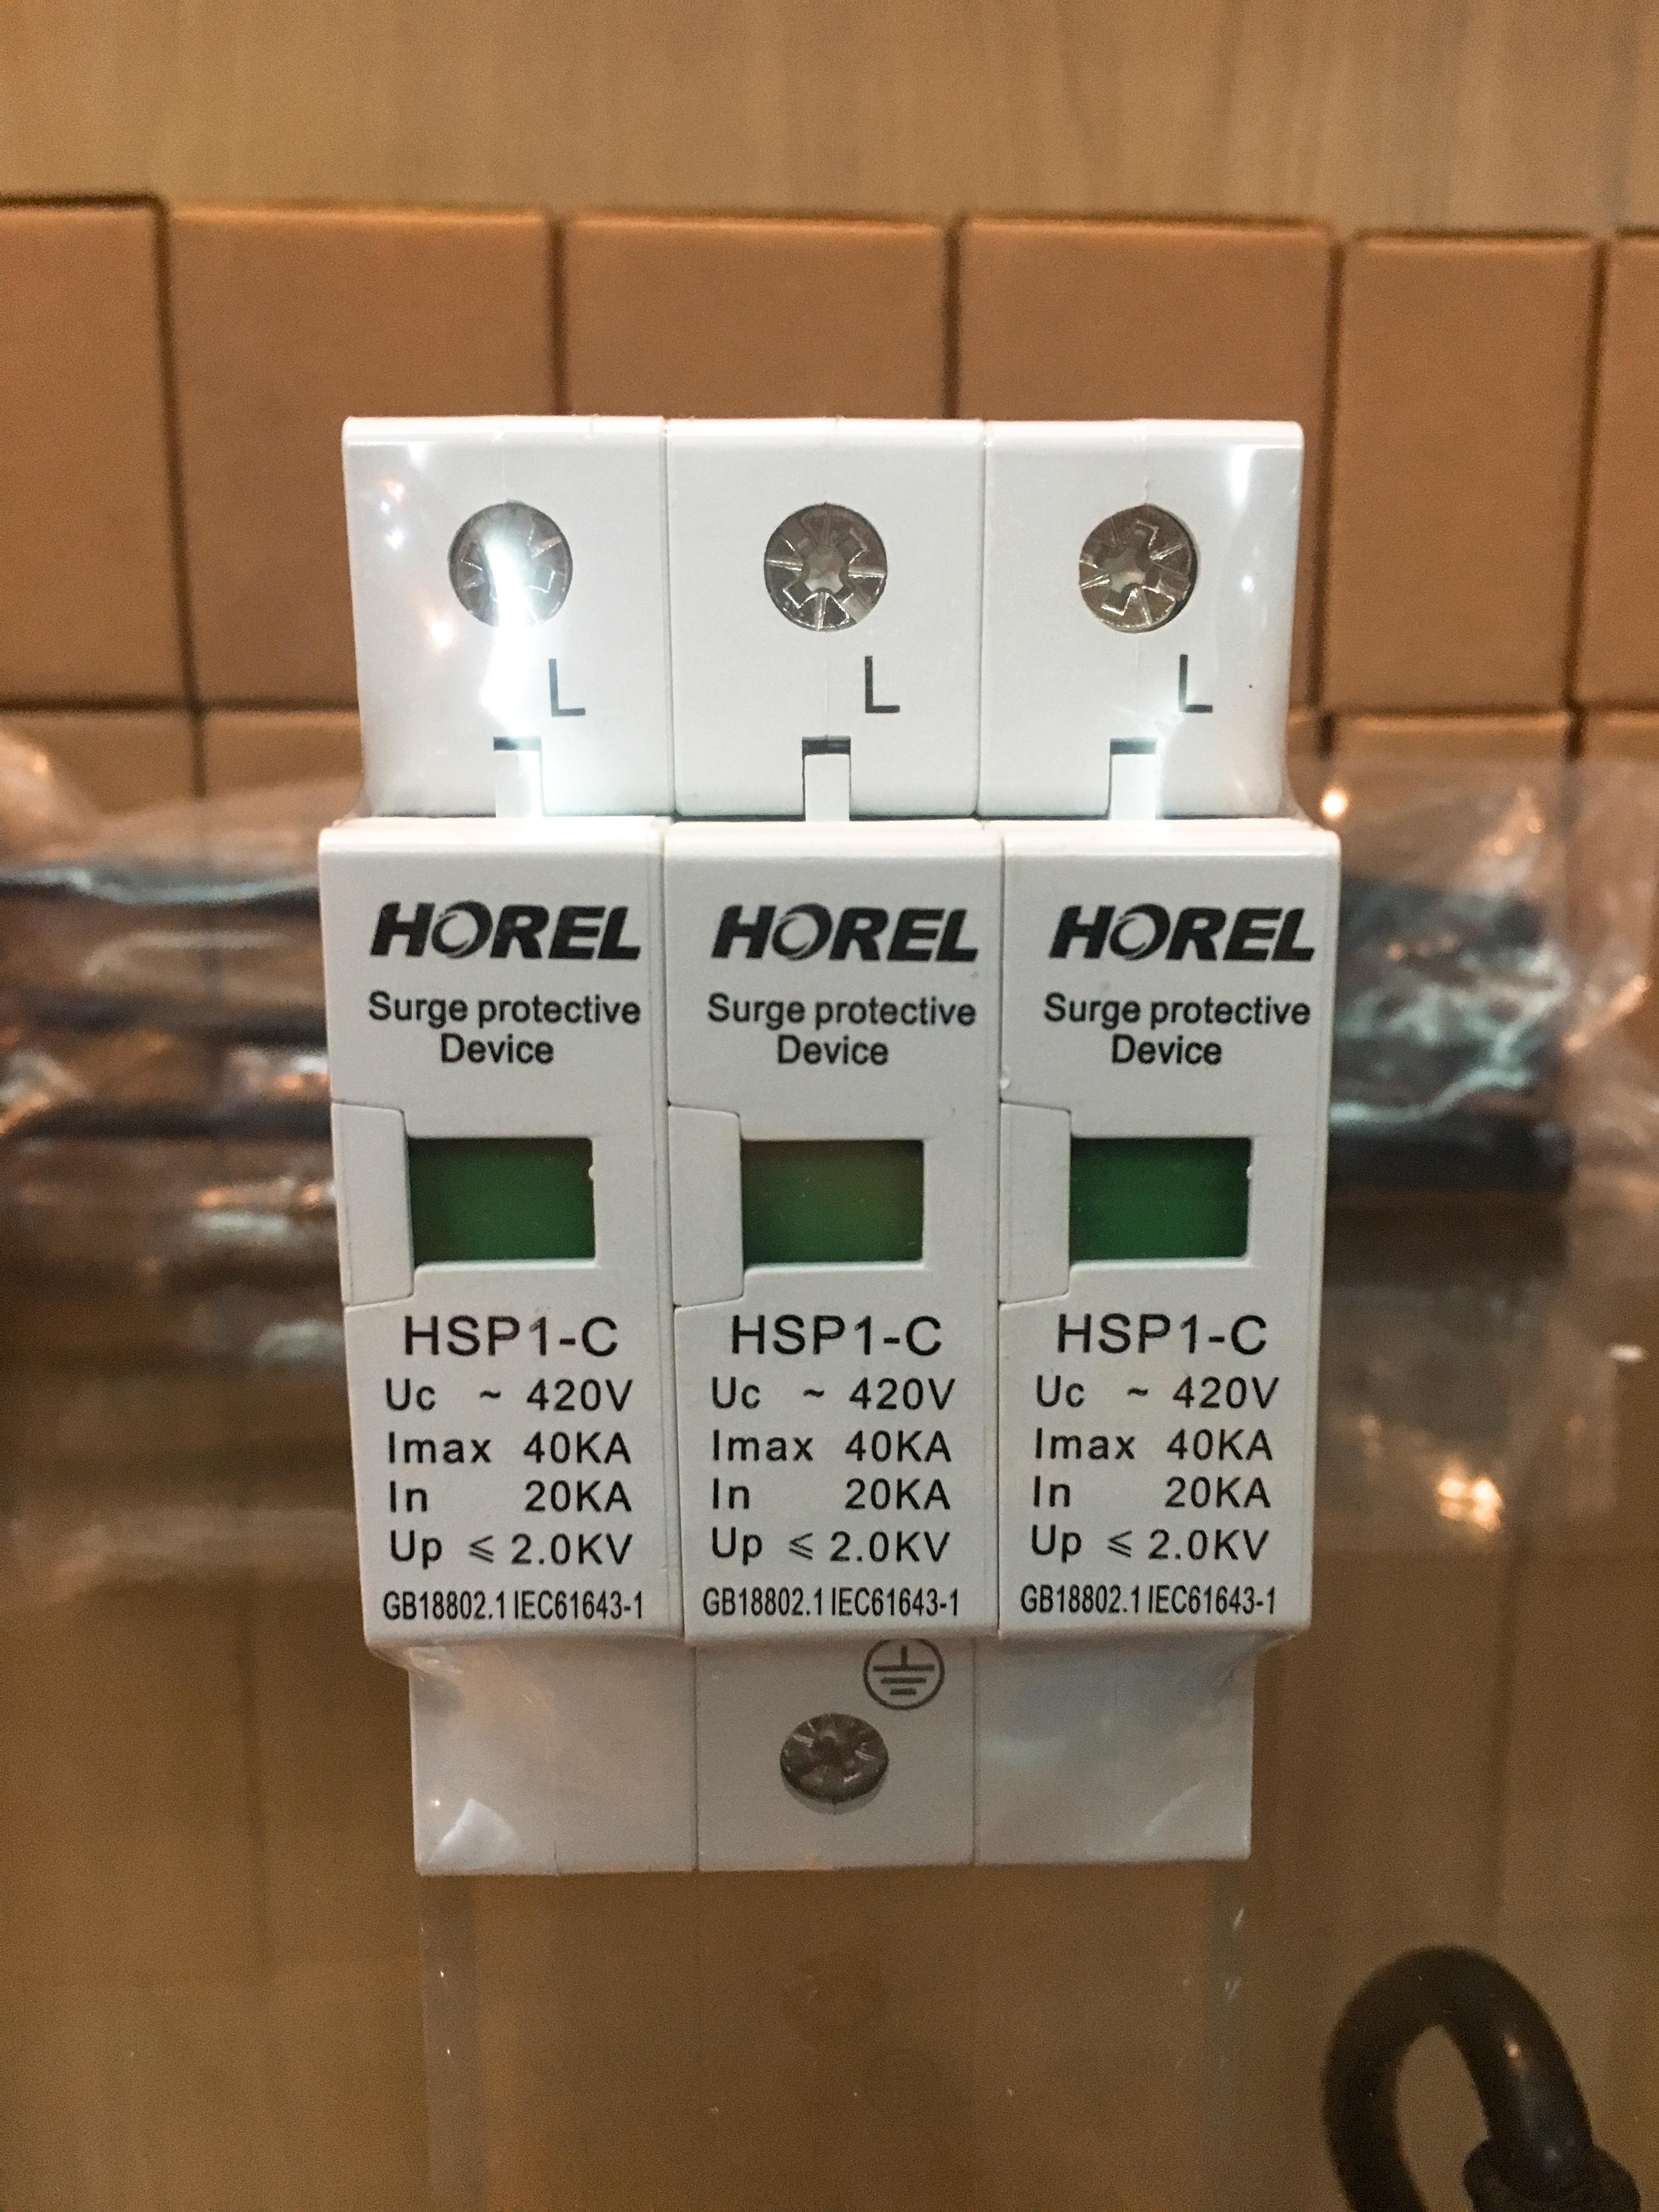 AC Power Surge Protective 415V 20A-40A 3P อุปกรณ์ป้องกันฟ้าผ่า AC 415 โวลต์ 20แอมป์ - 40แอมป์